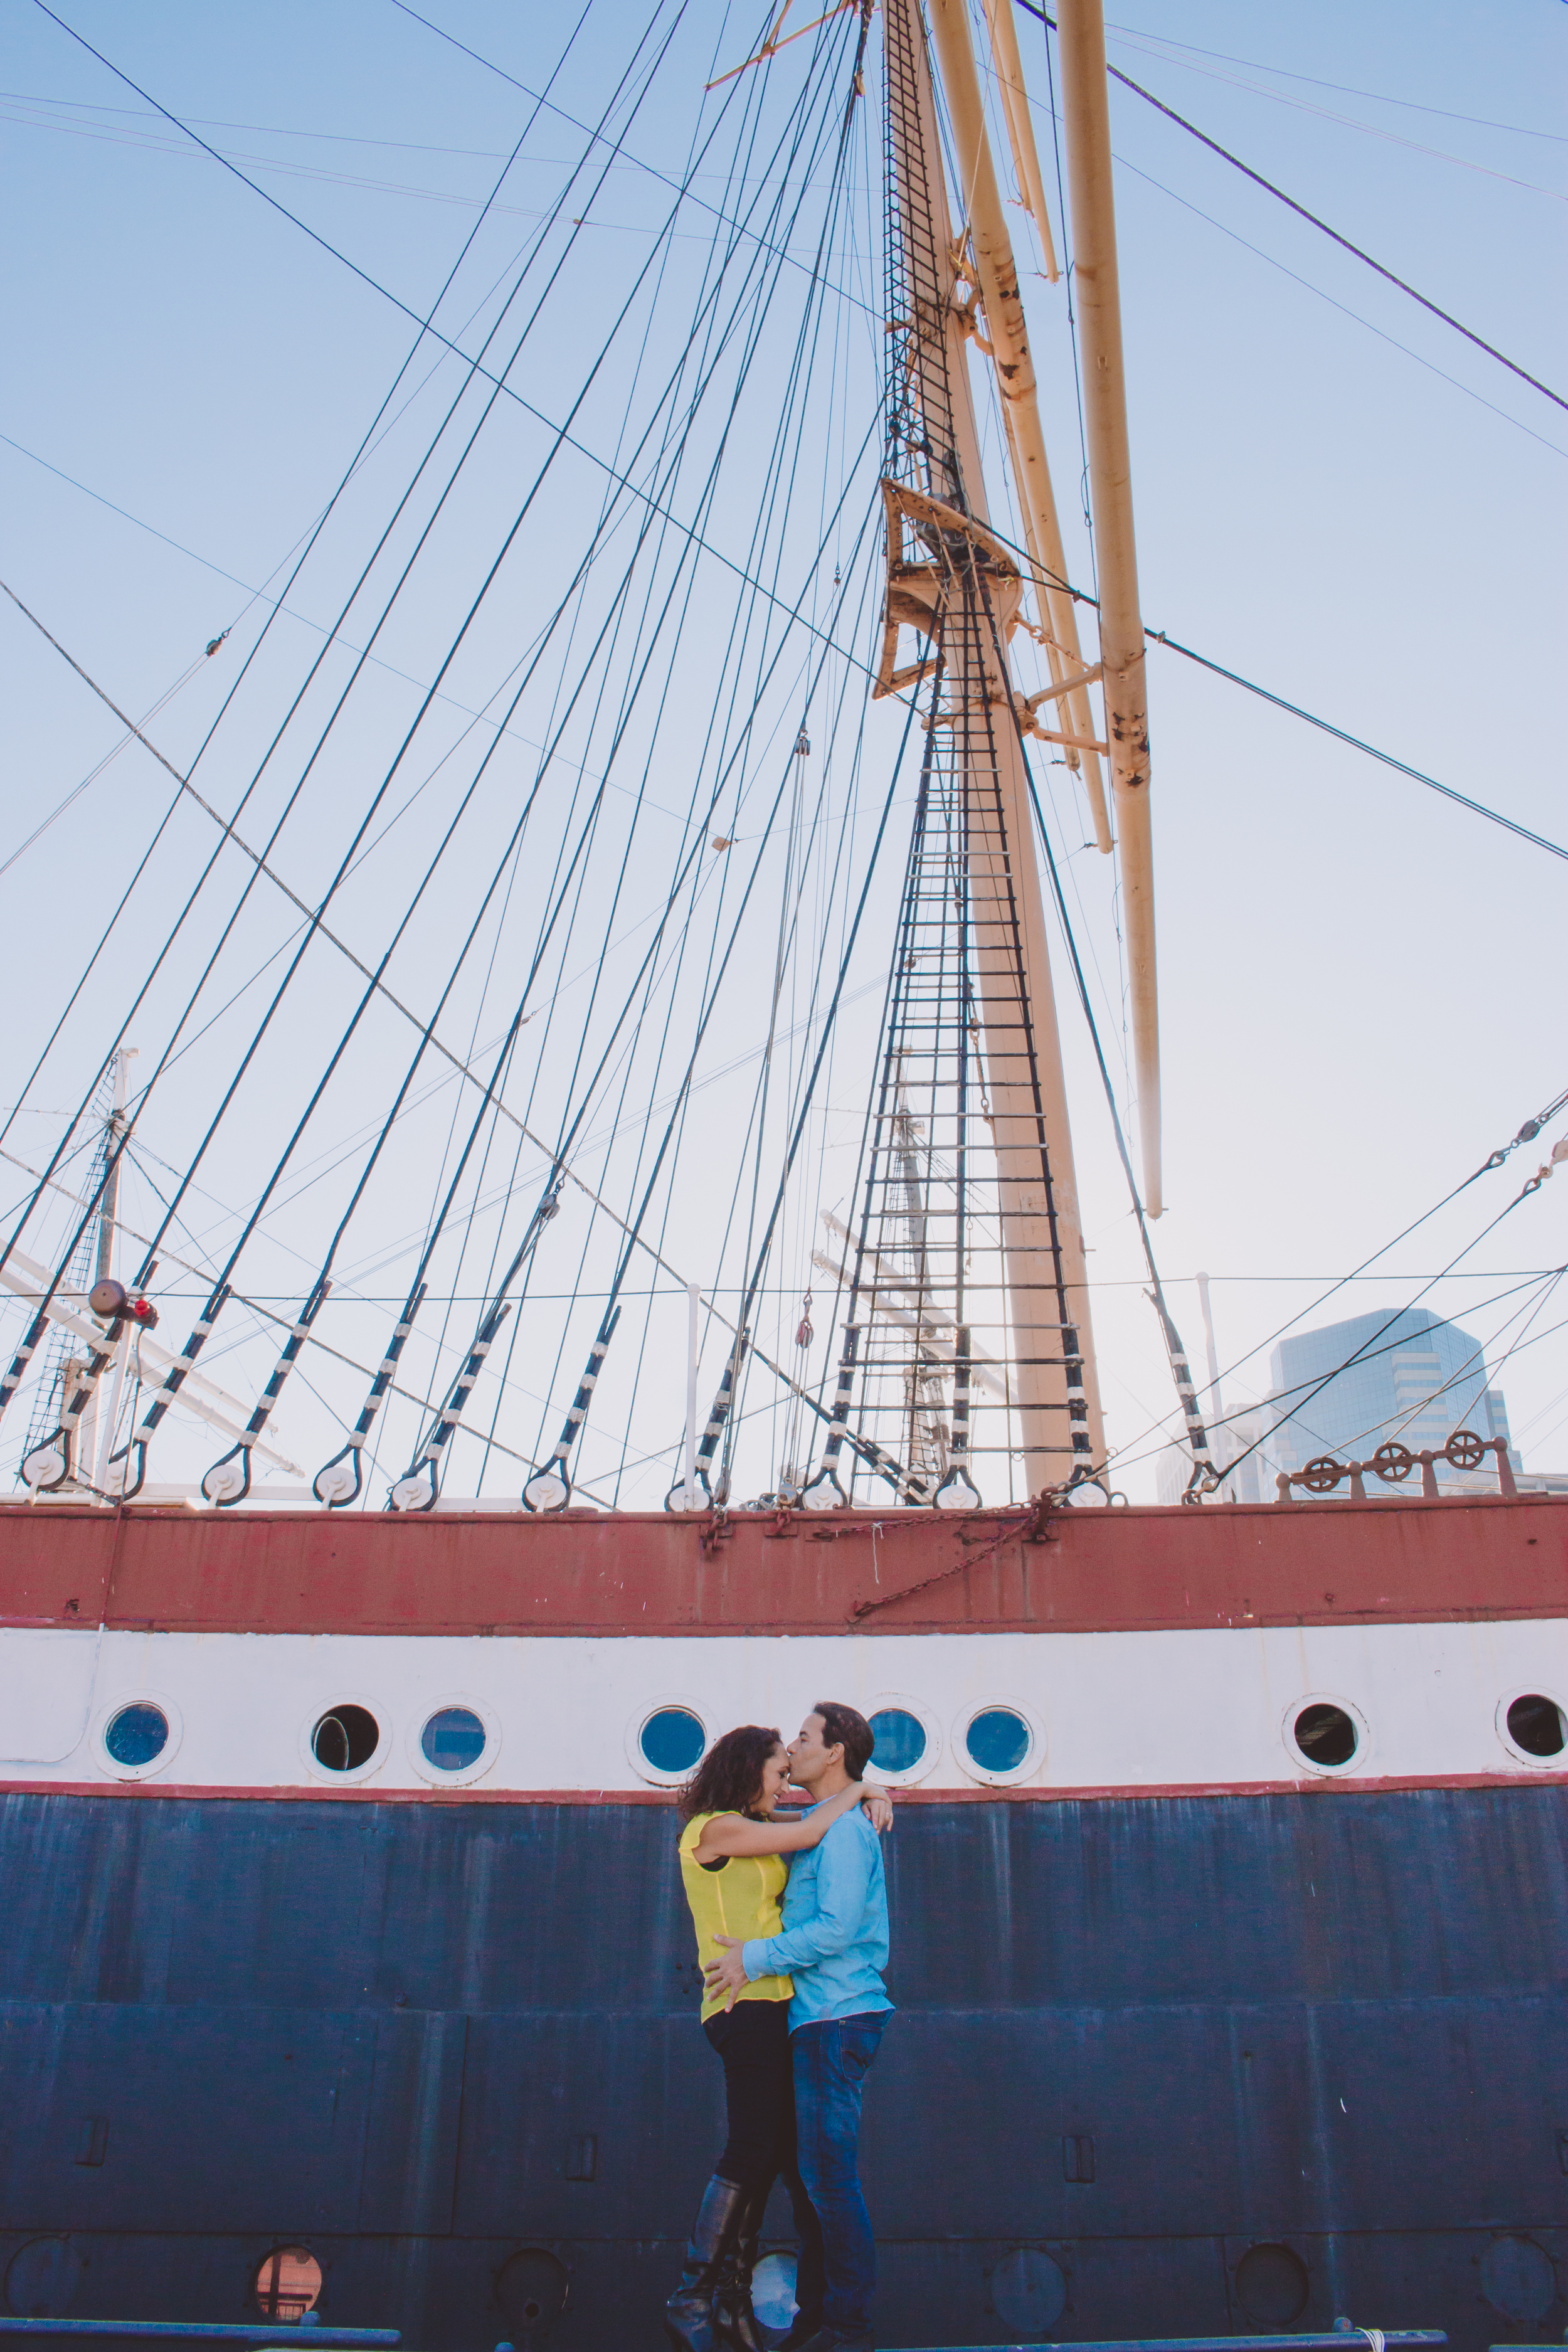 Engagement photos near large ship